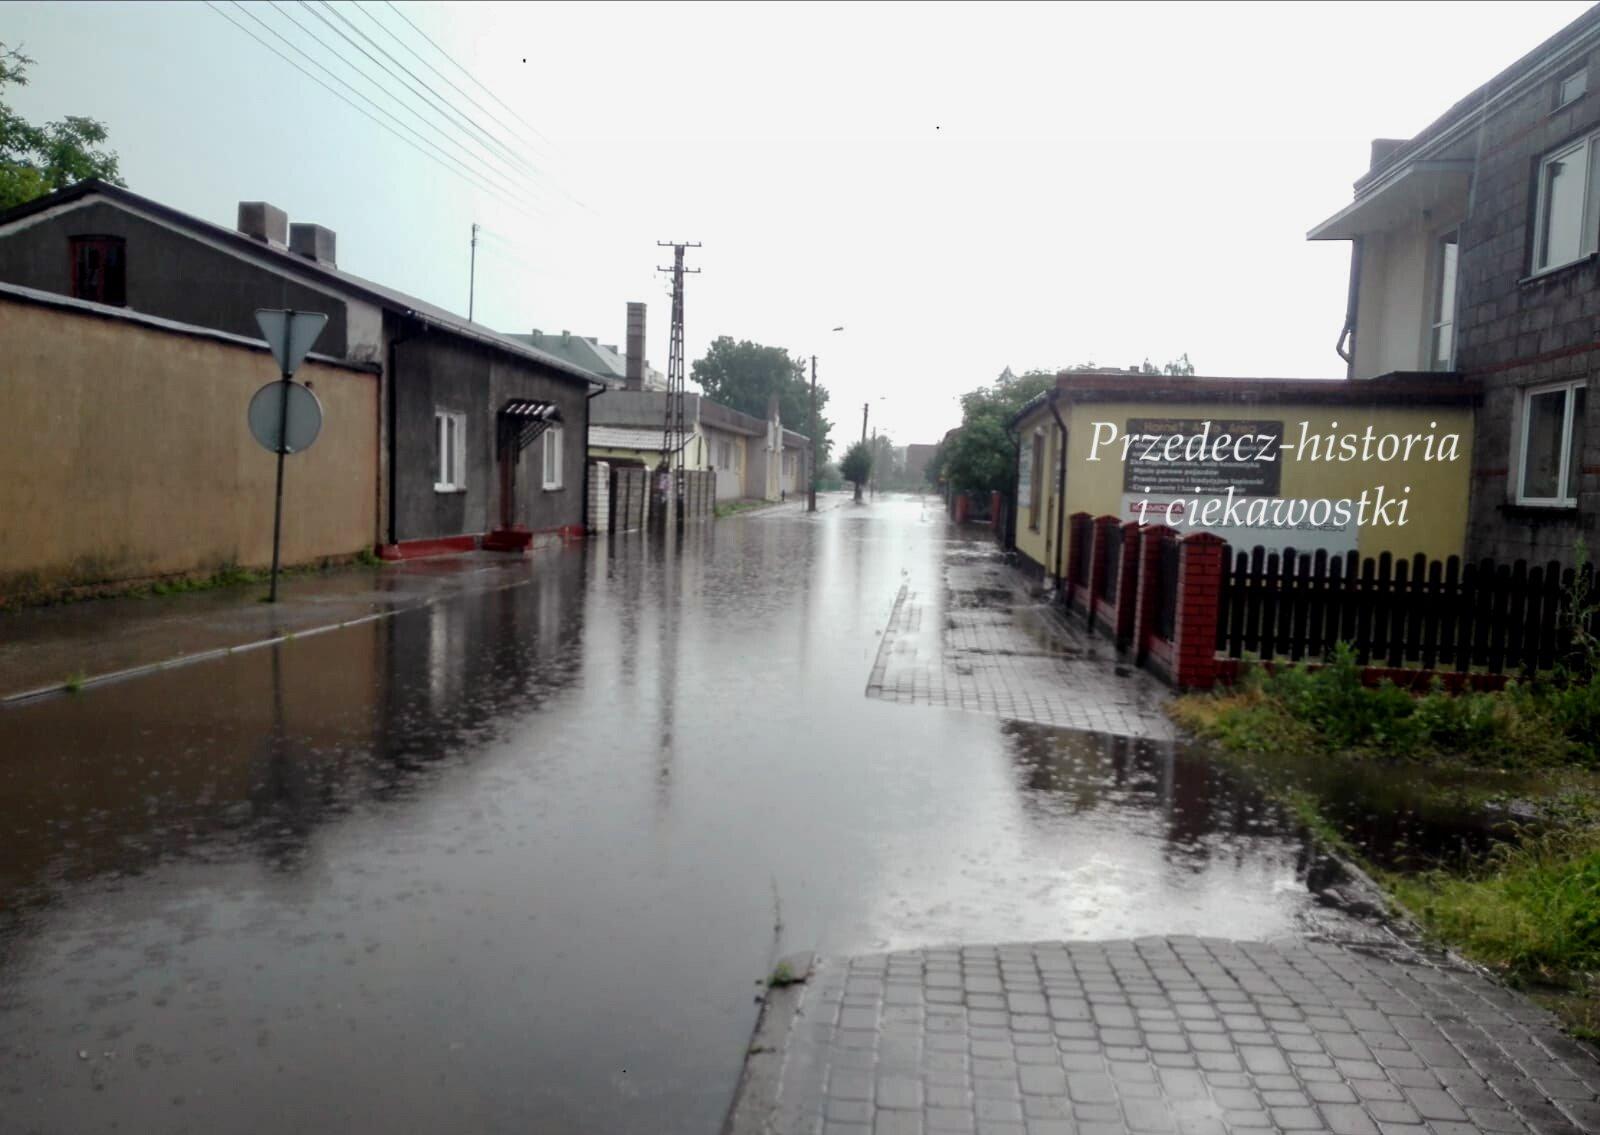 15-minutowa ulewa – ulice Przedcza zalane